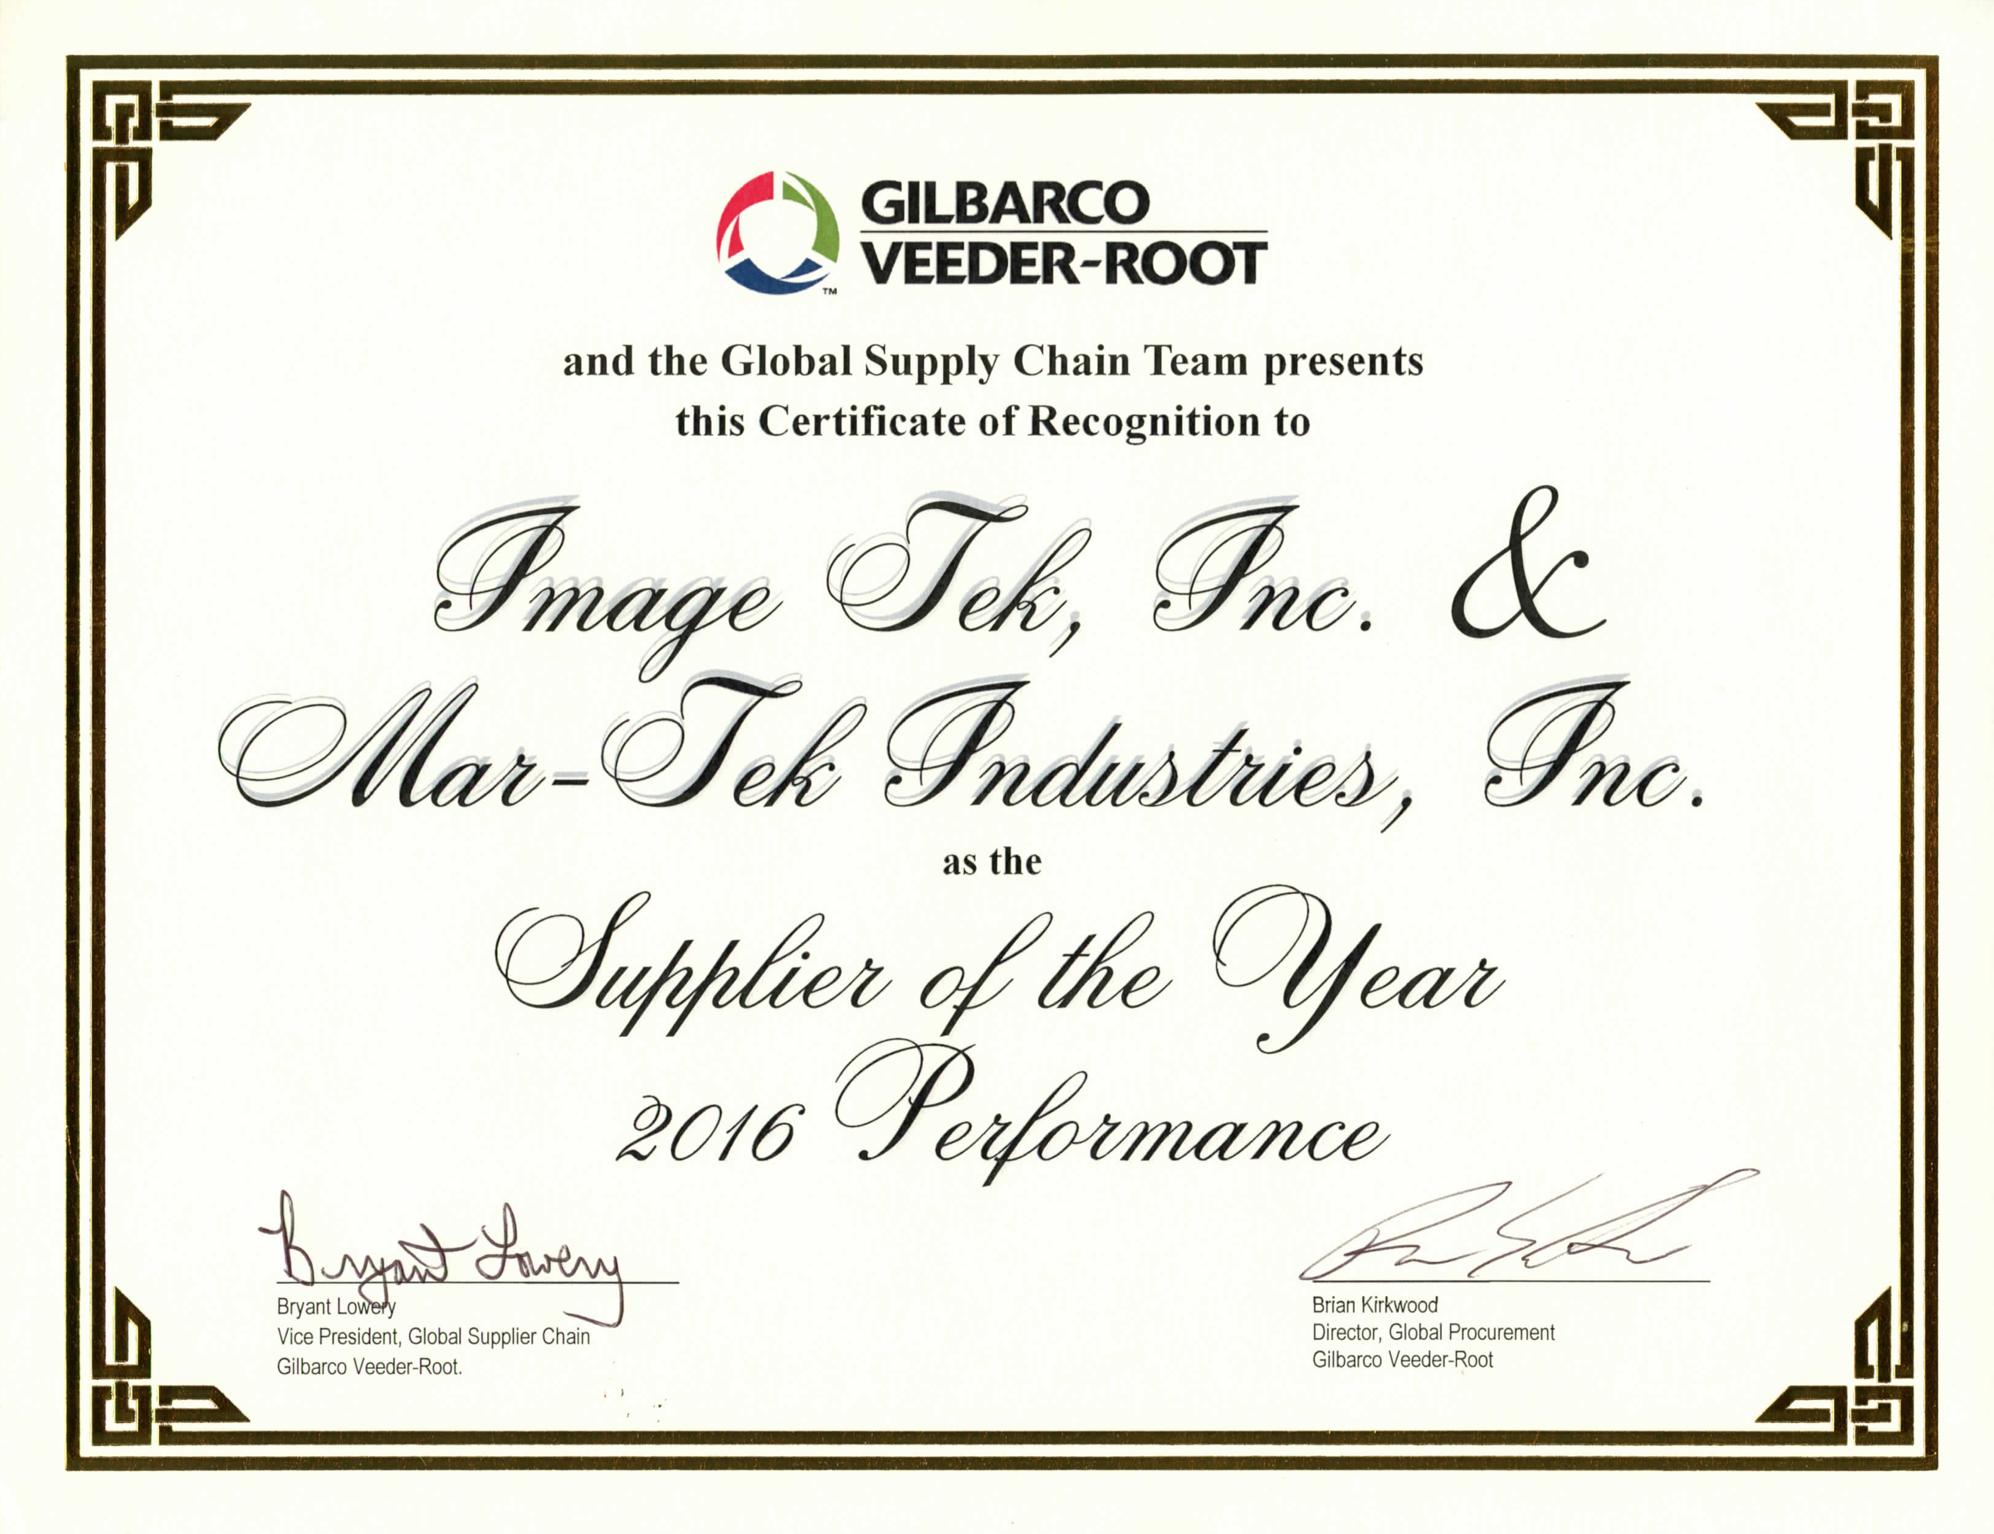 Gilbarco Veeder Root Presents Certificate Of Recognition Mar Tek